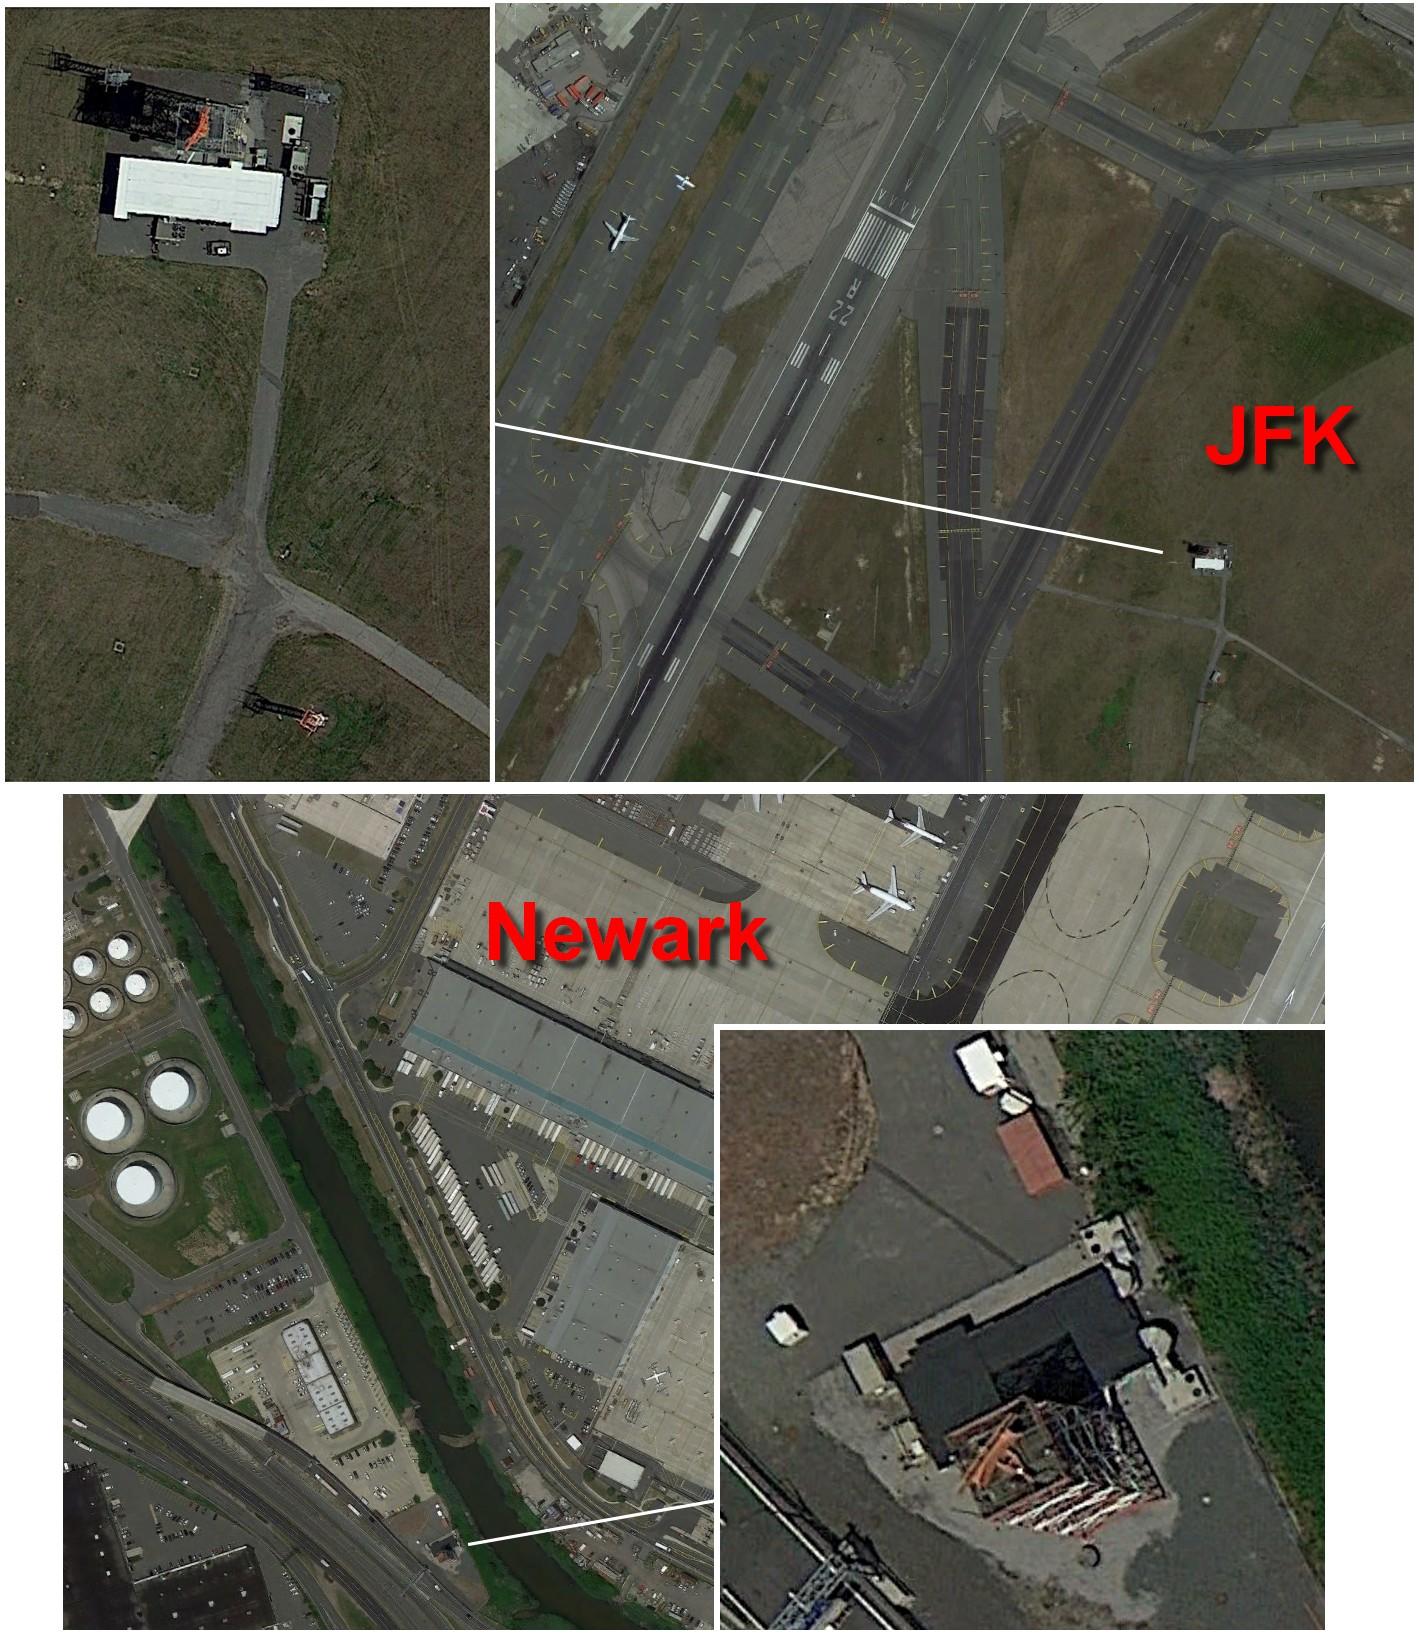 http://unique.annonce.free.fr/images/jfk_newark_radars.jpg